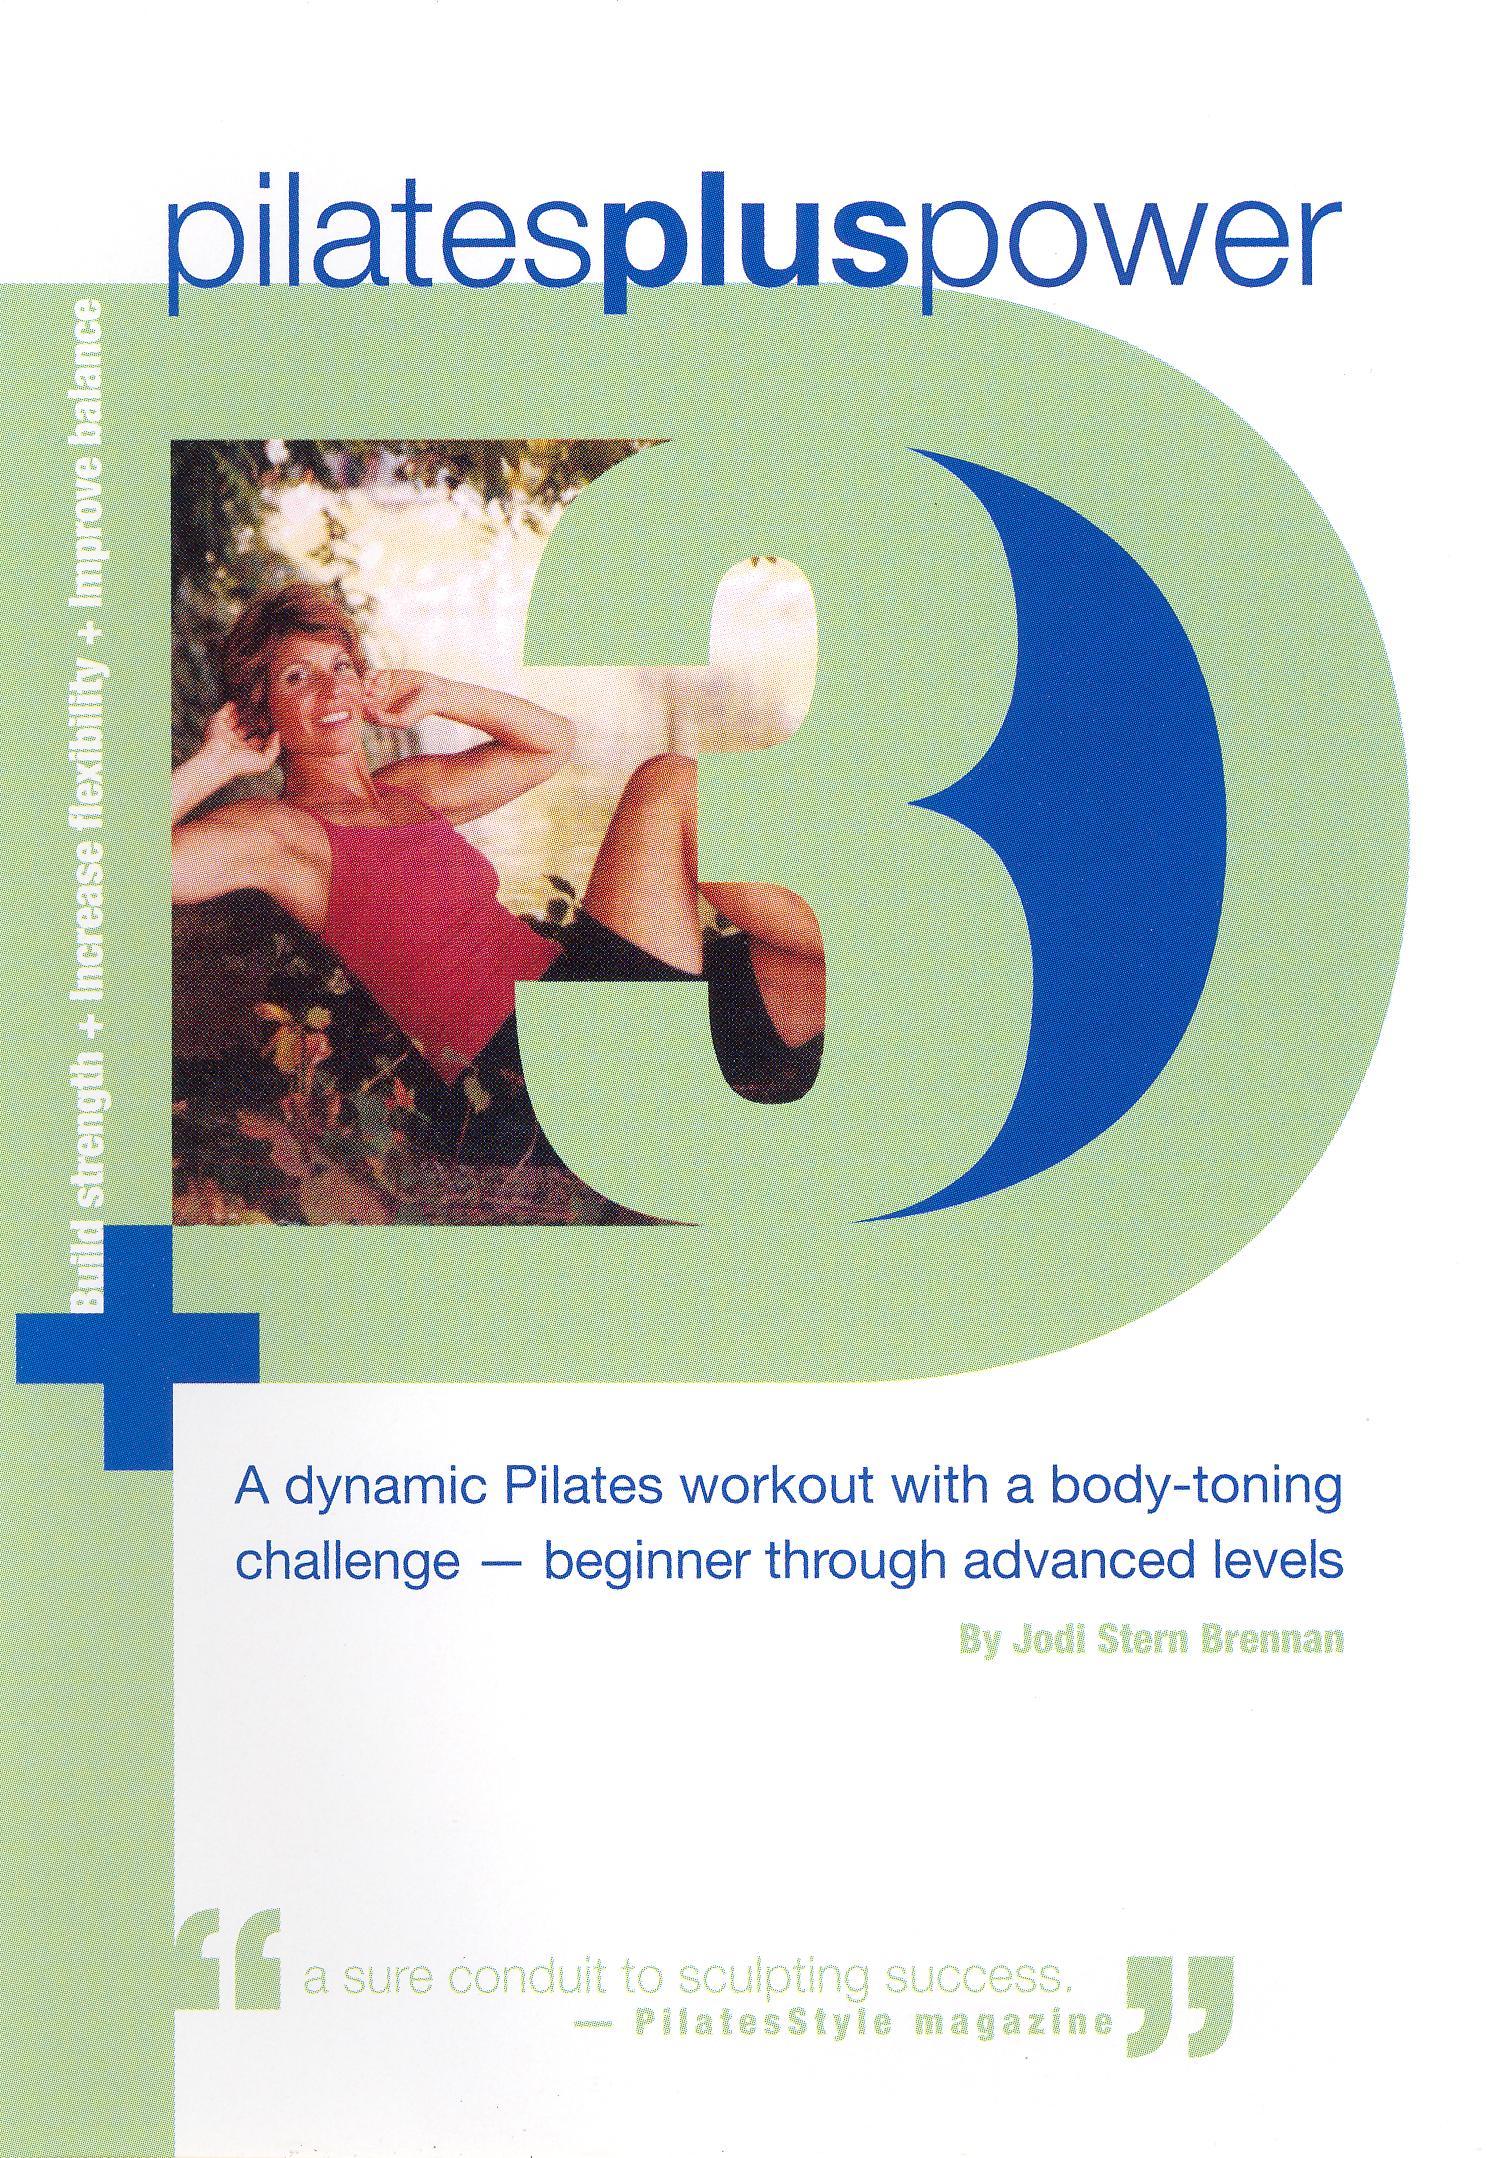 Jodi Stern Brennan: Pilates Plus Power: P3